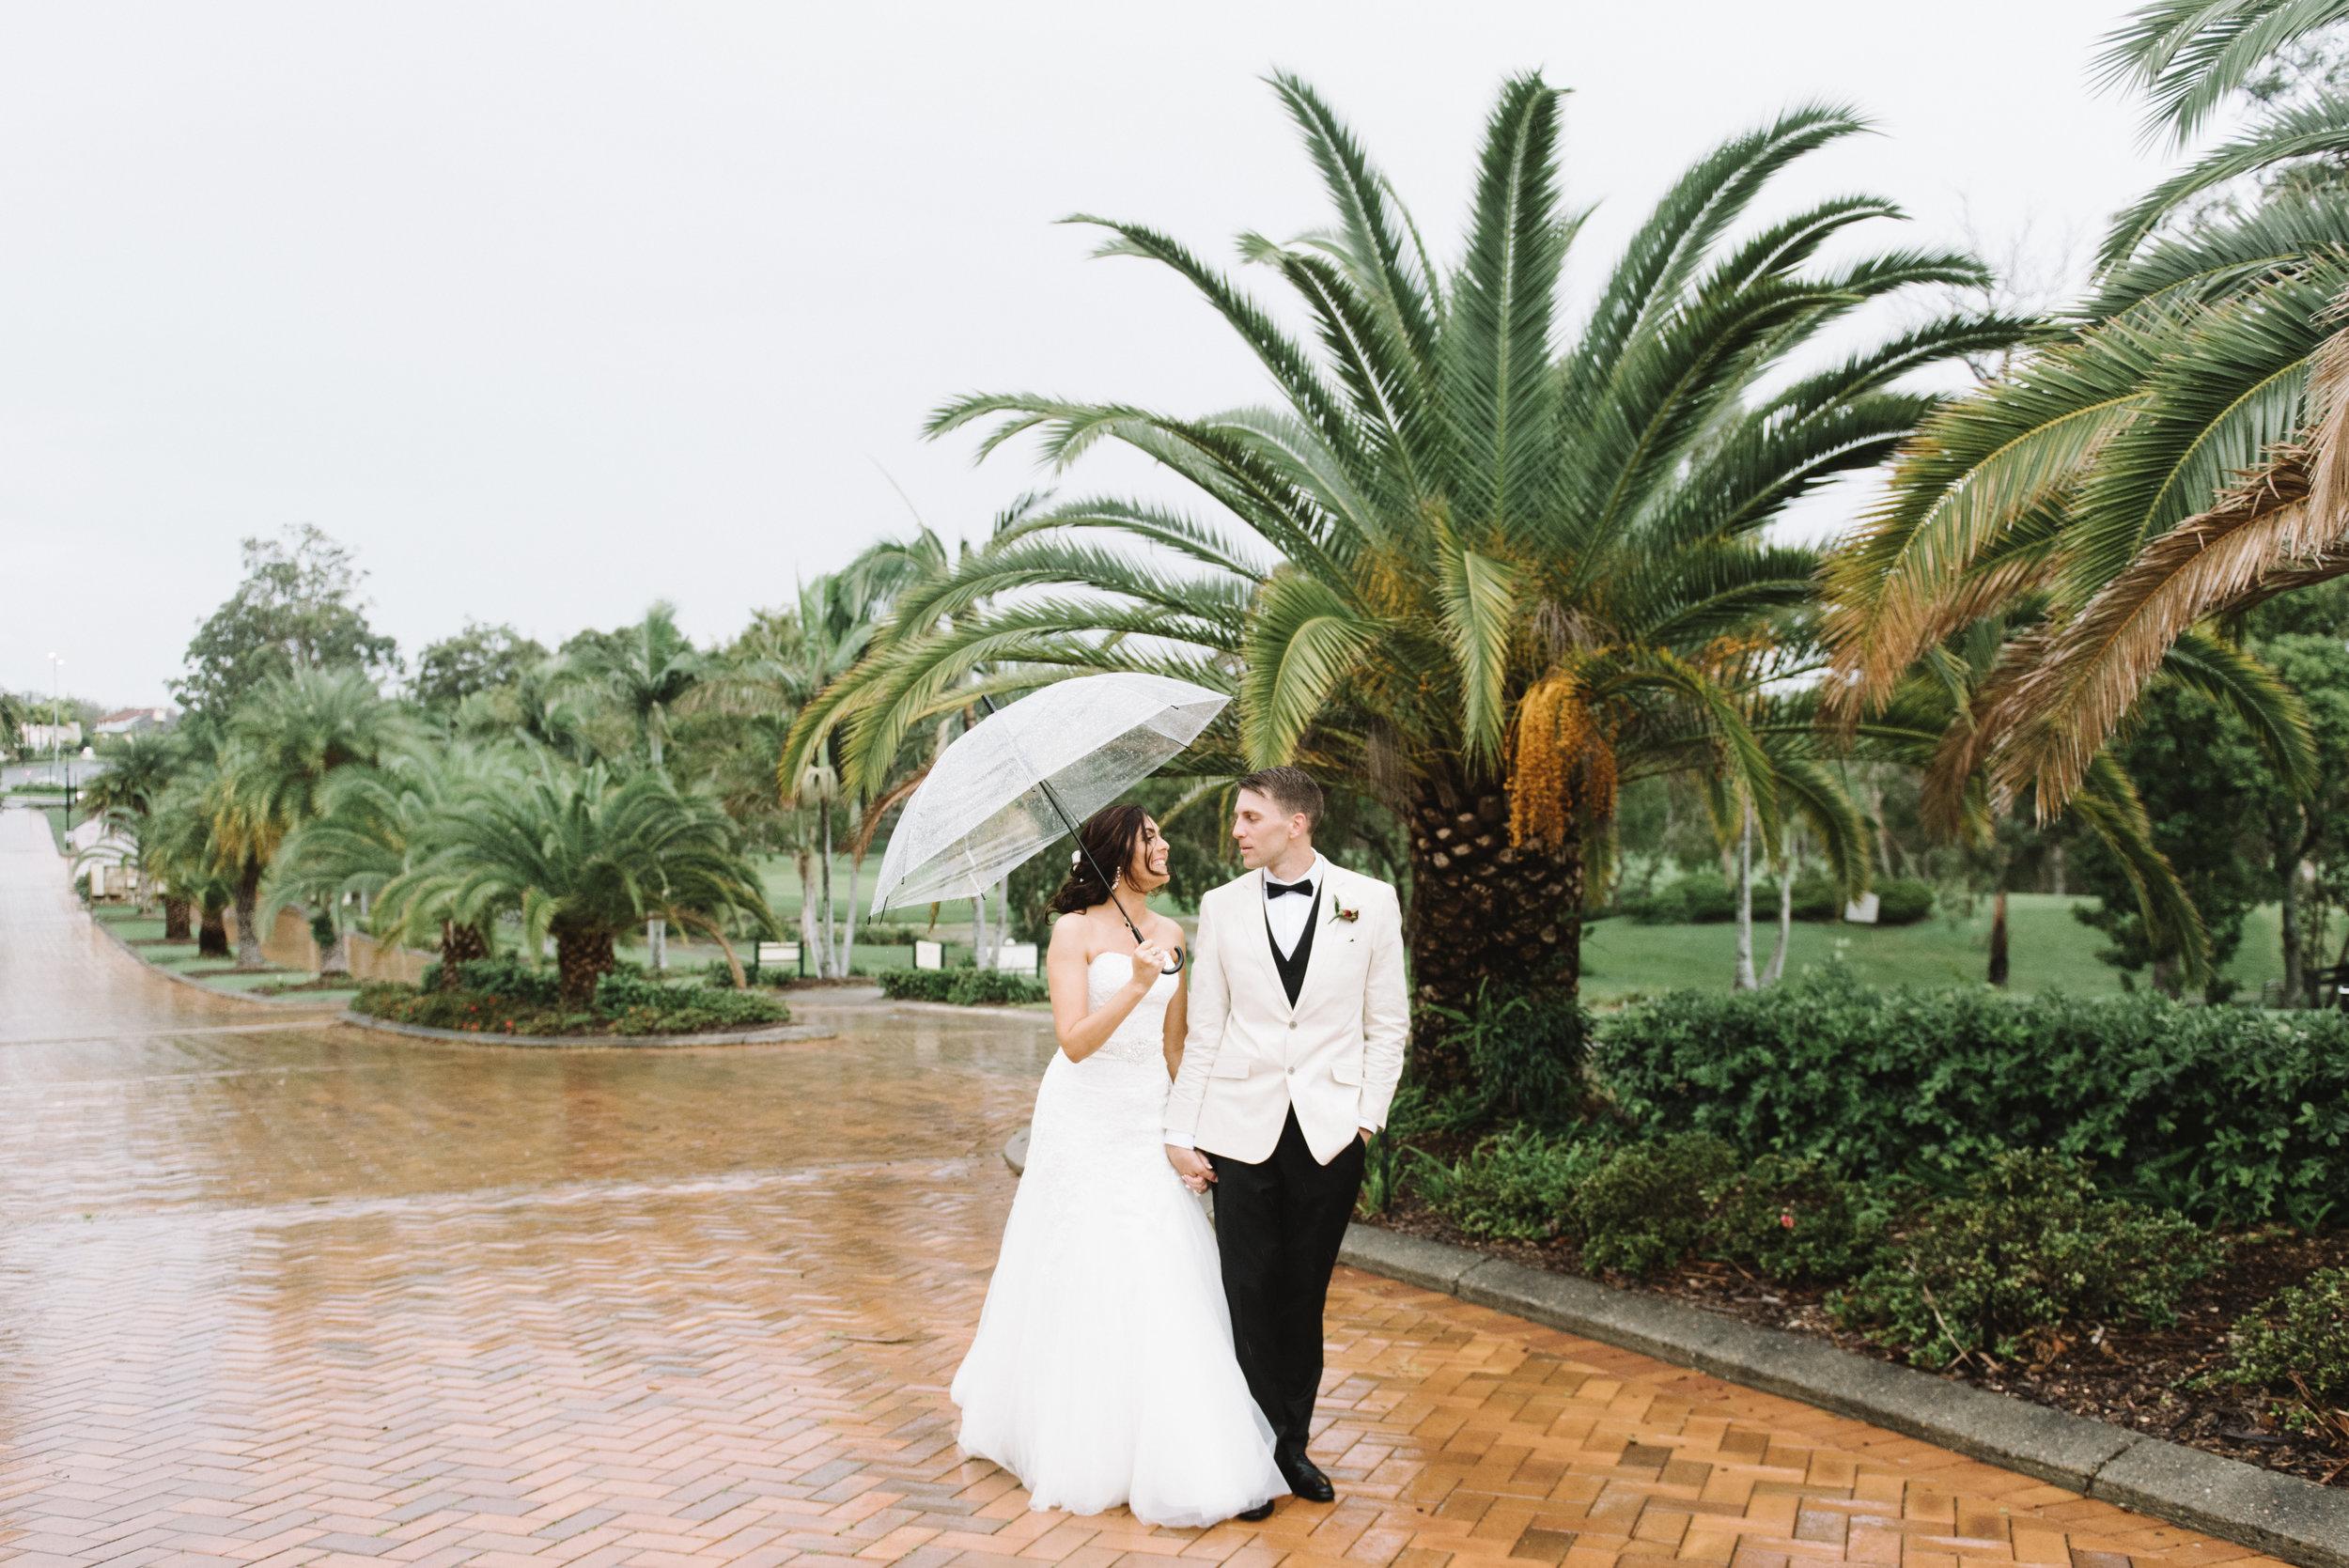 Gold-Coast-Arundel-Hills-Country-Club-Wedding-Photography-39.jpg